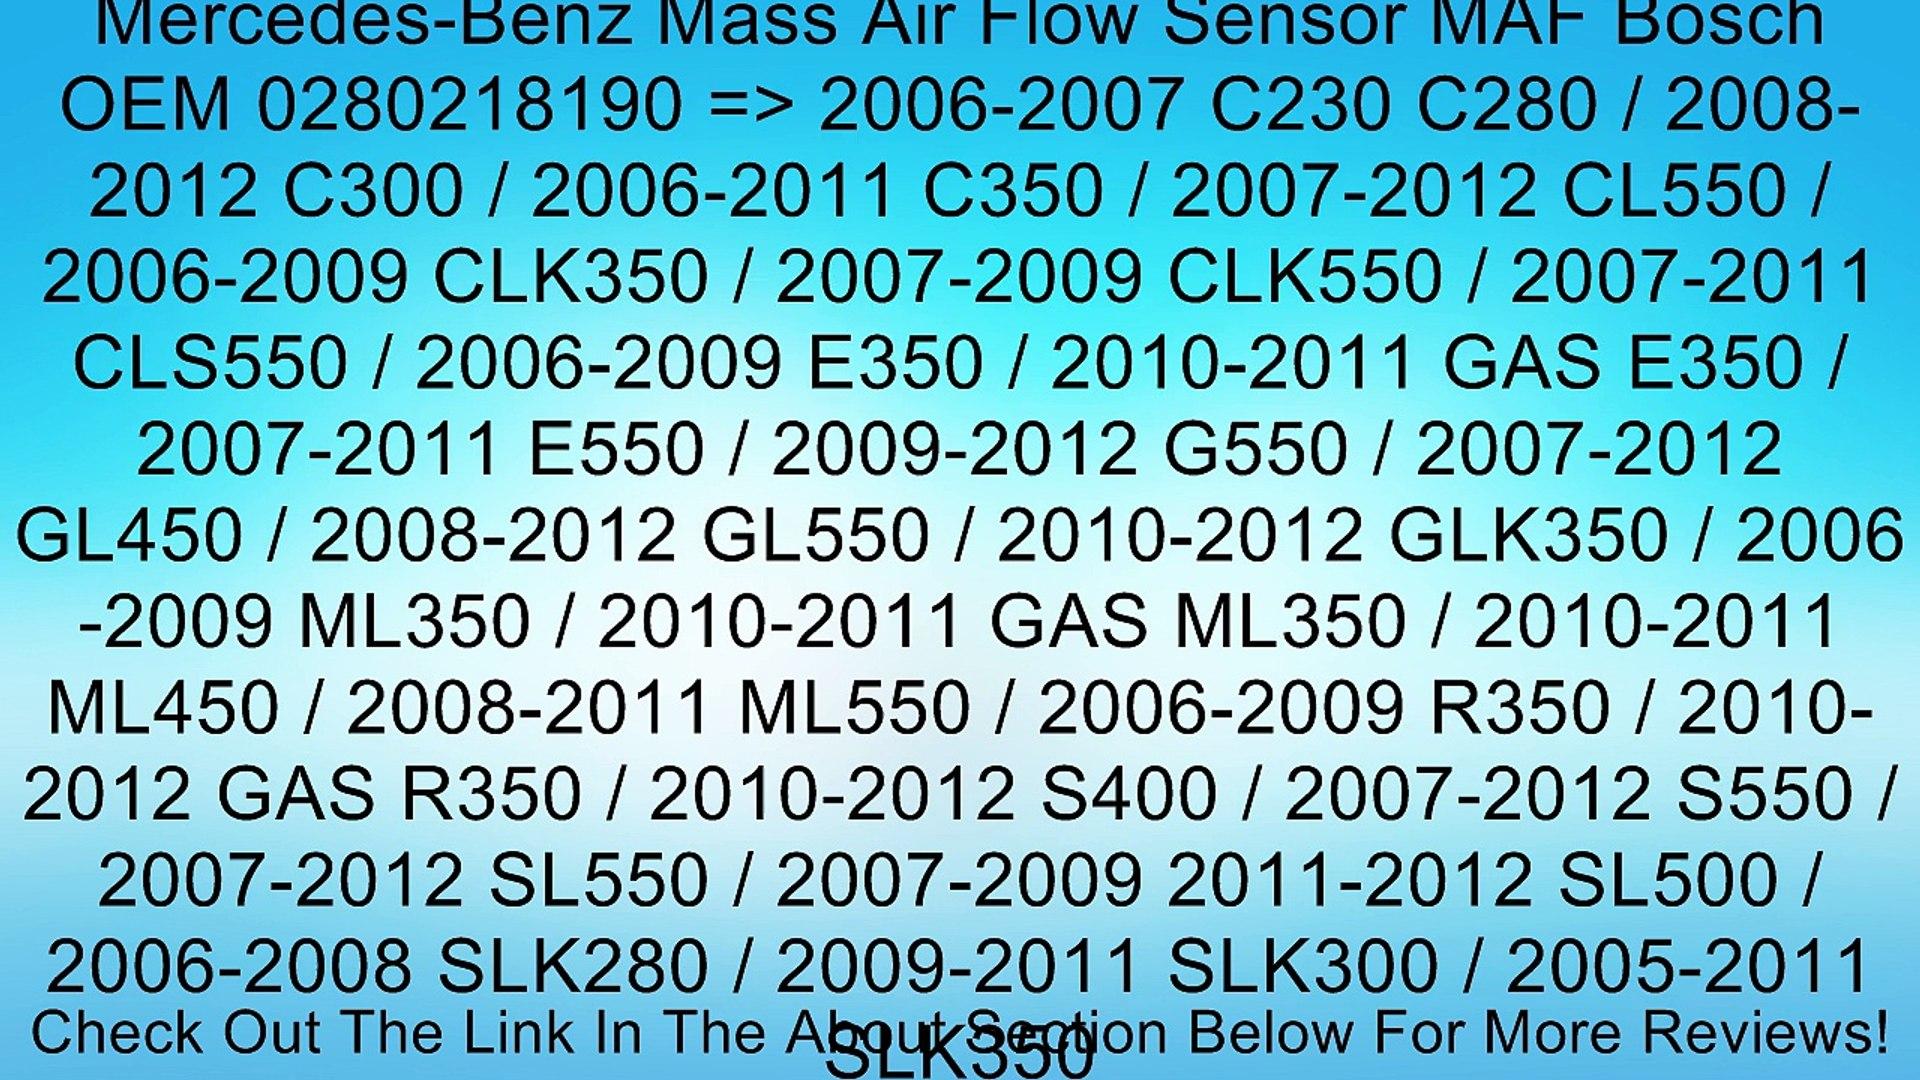 Mercedes-Benz Mass Air Flow Sensor MAF Bosch OEM 0280218190 => 2006-2007 C230 C280 / 2008-2012 C300 / 2006-2011 C350 / 2007-2012 CL550 / 2006-2009 CLK350 / 2007-2009 CLK550 / 2007-2011 CLS550 / 2006-2009 E350 / 2010-2011 GAS E350 / 2007-2011 E550 / 2009-2